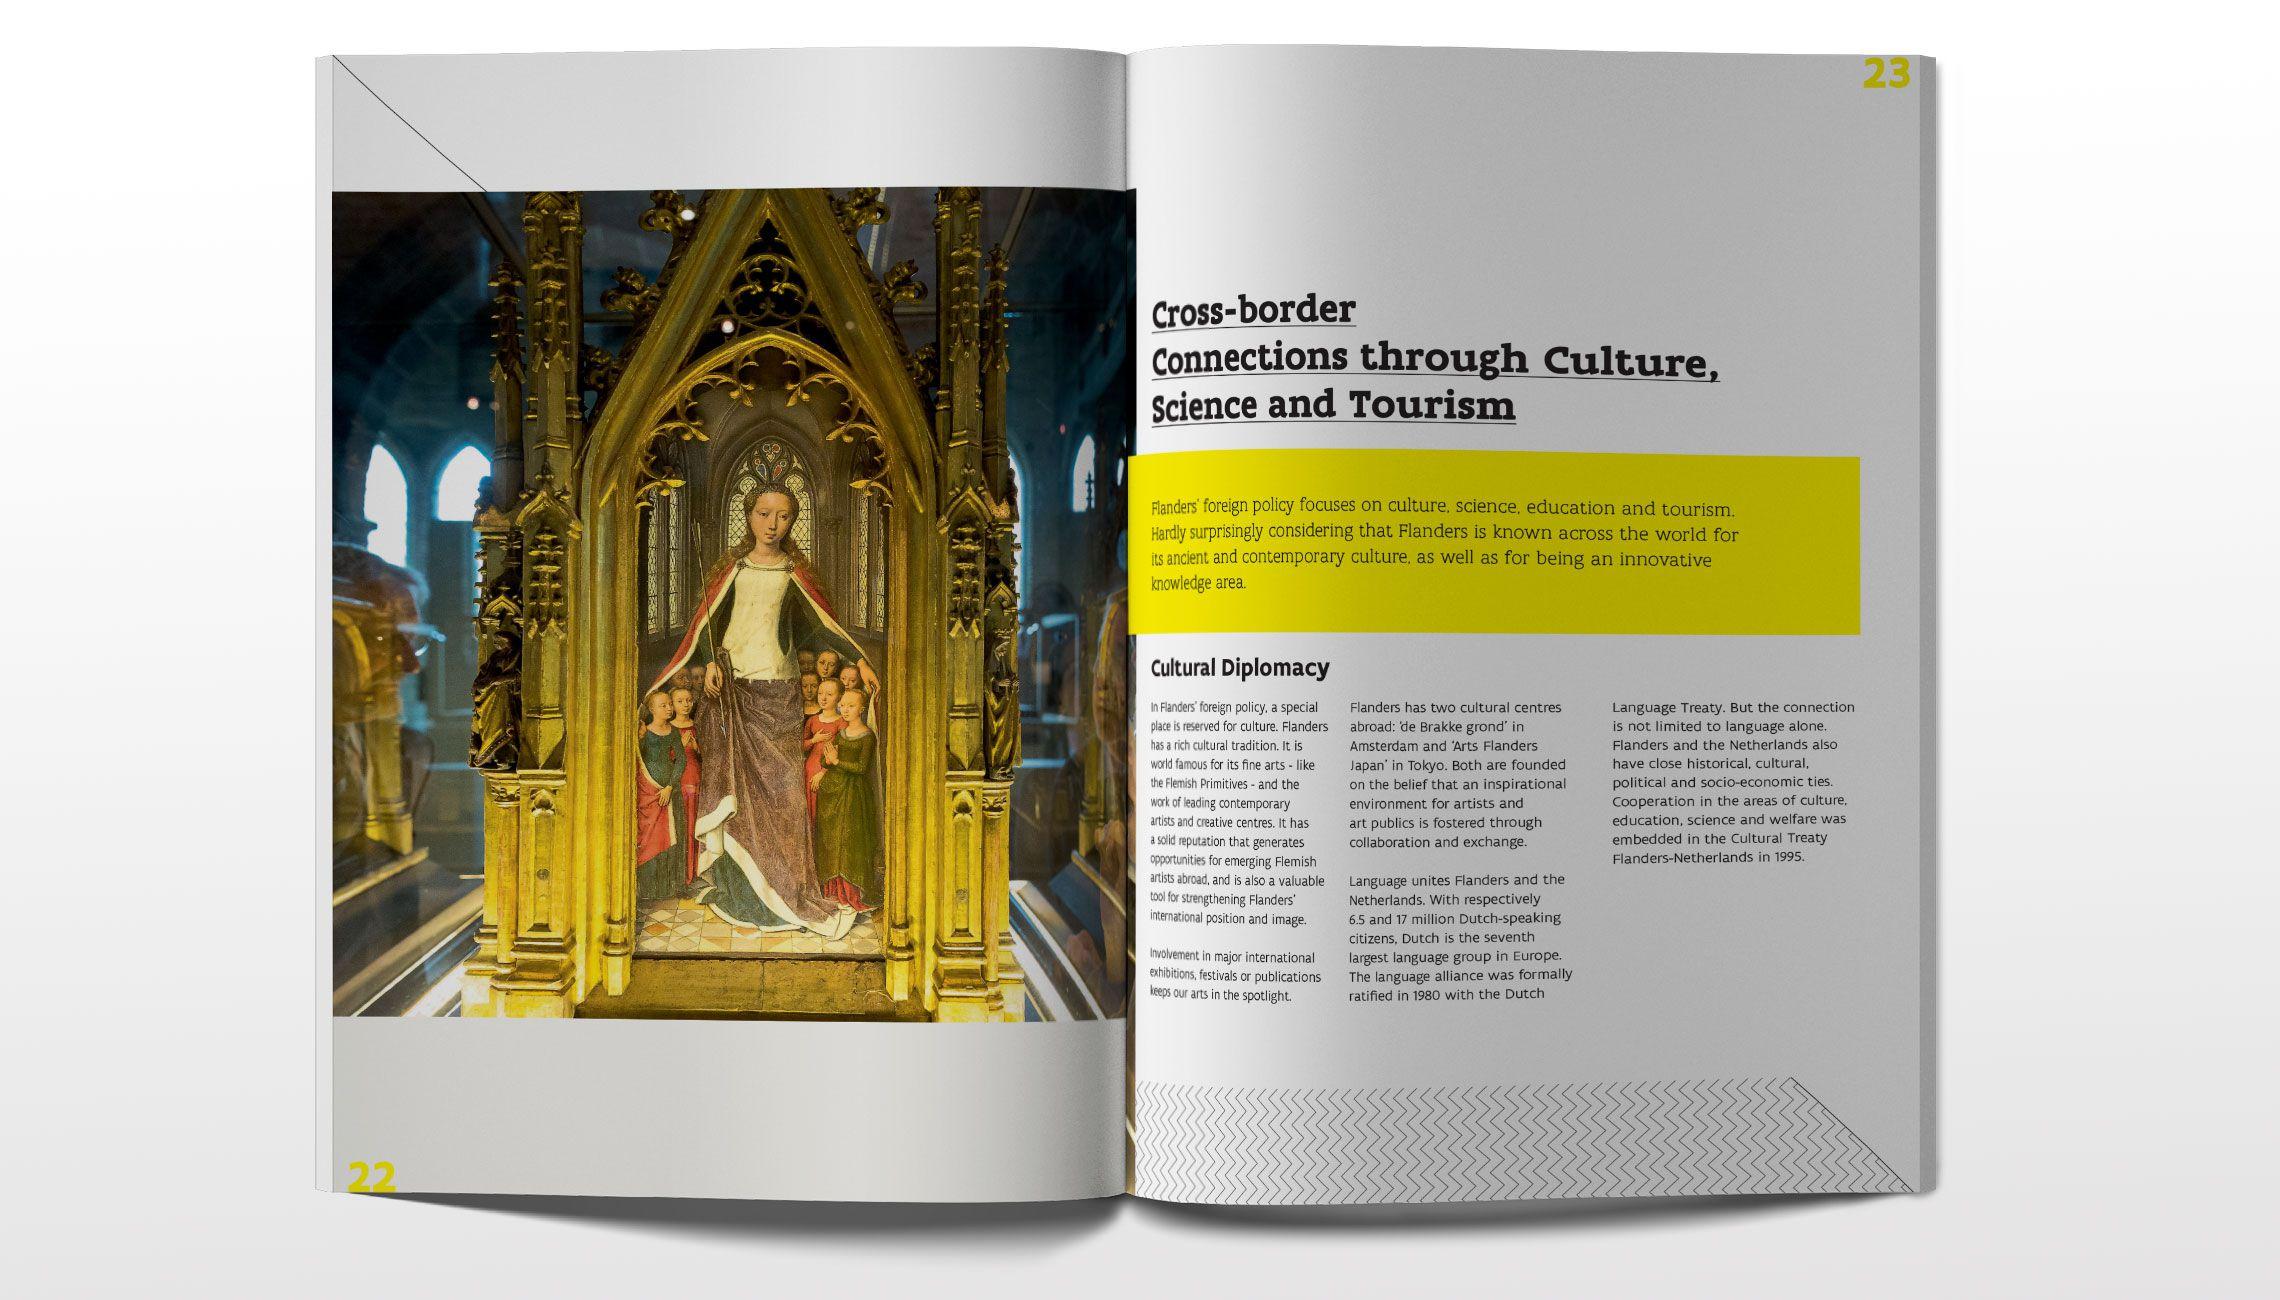 publication: Flanders is international - image 1